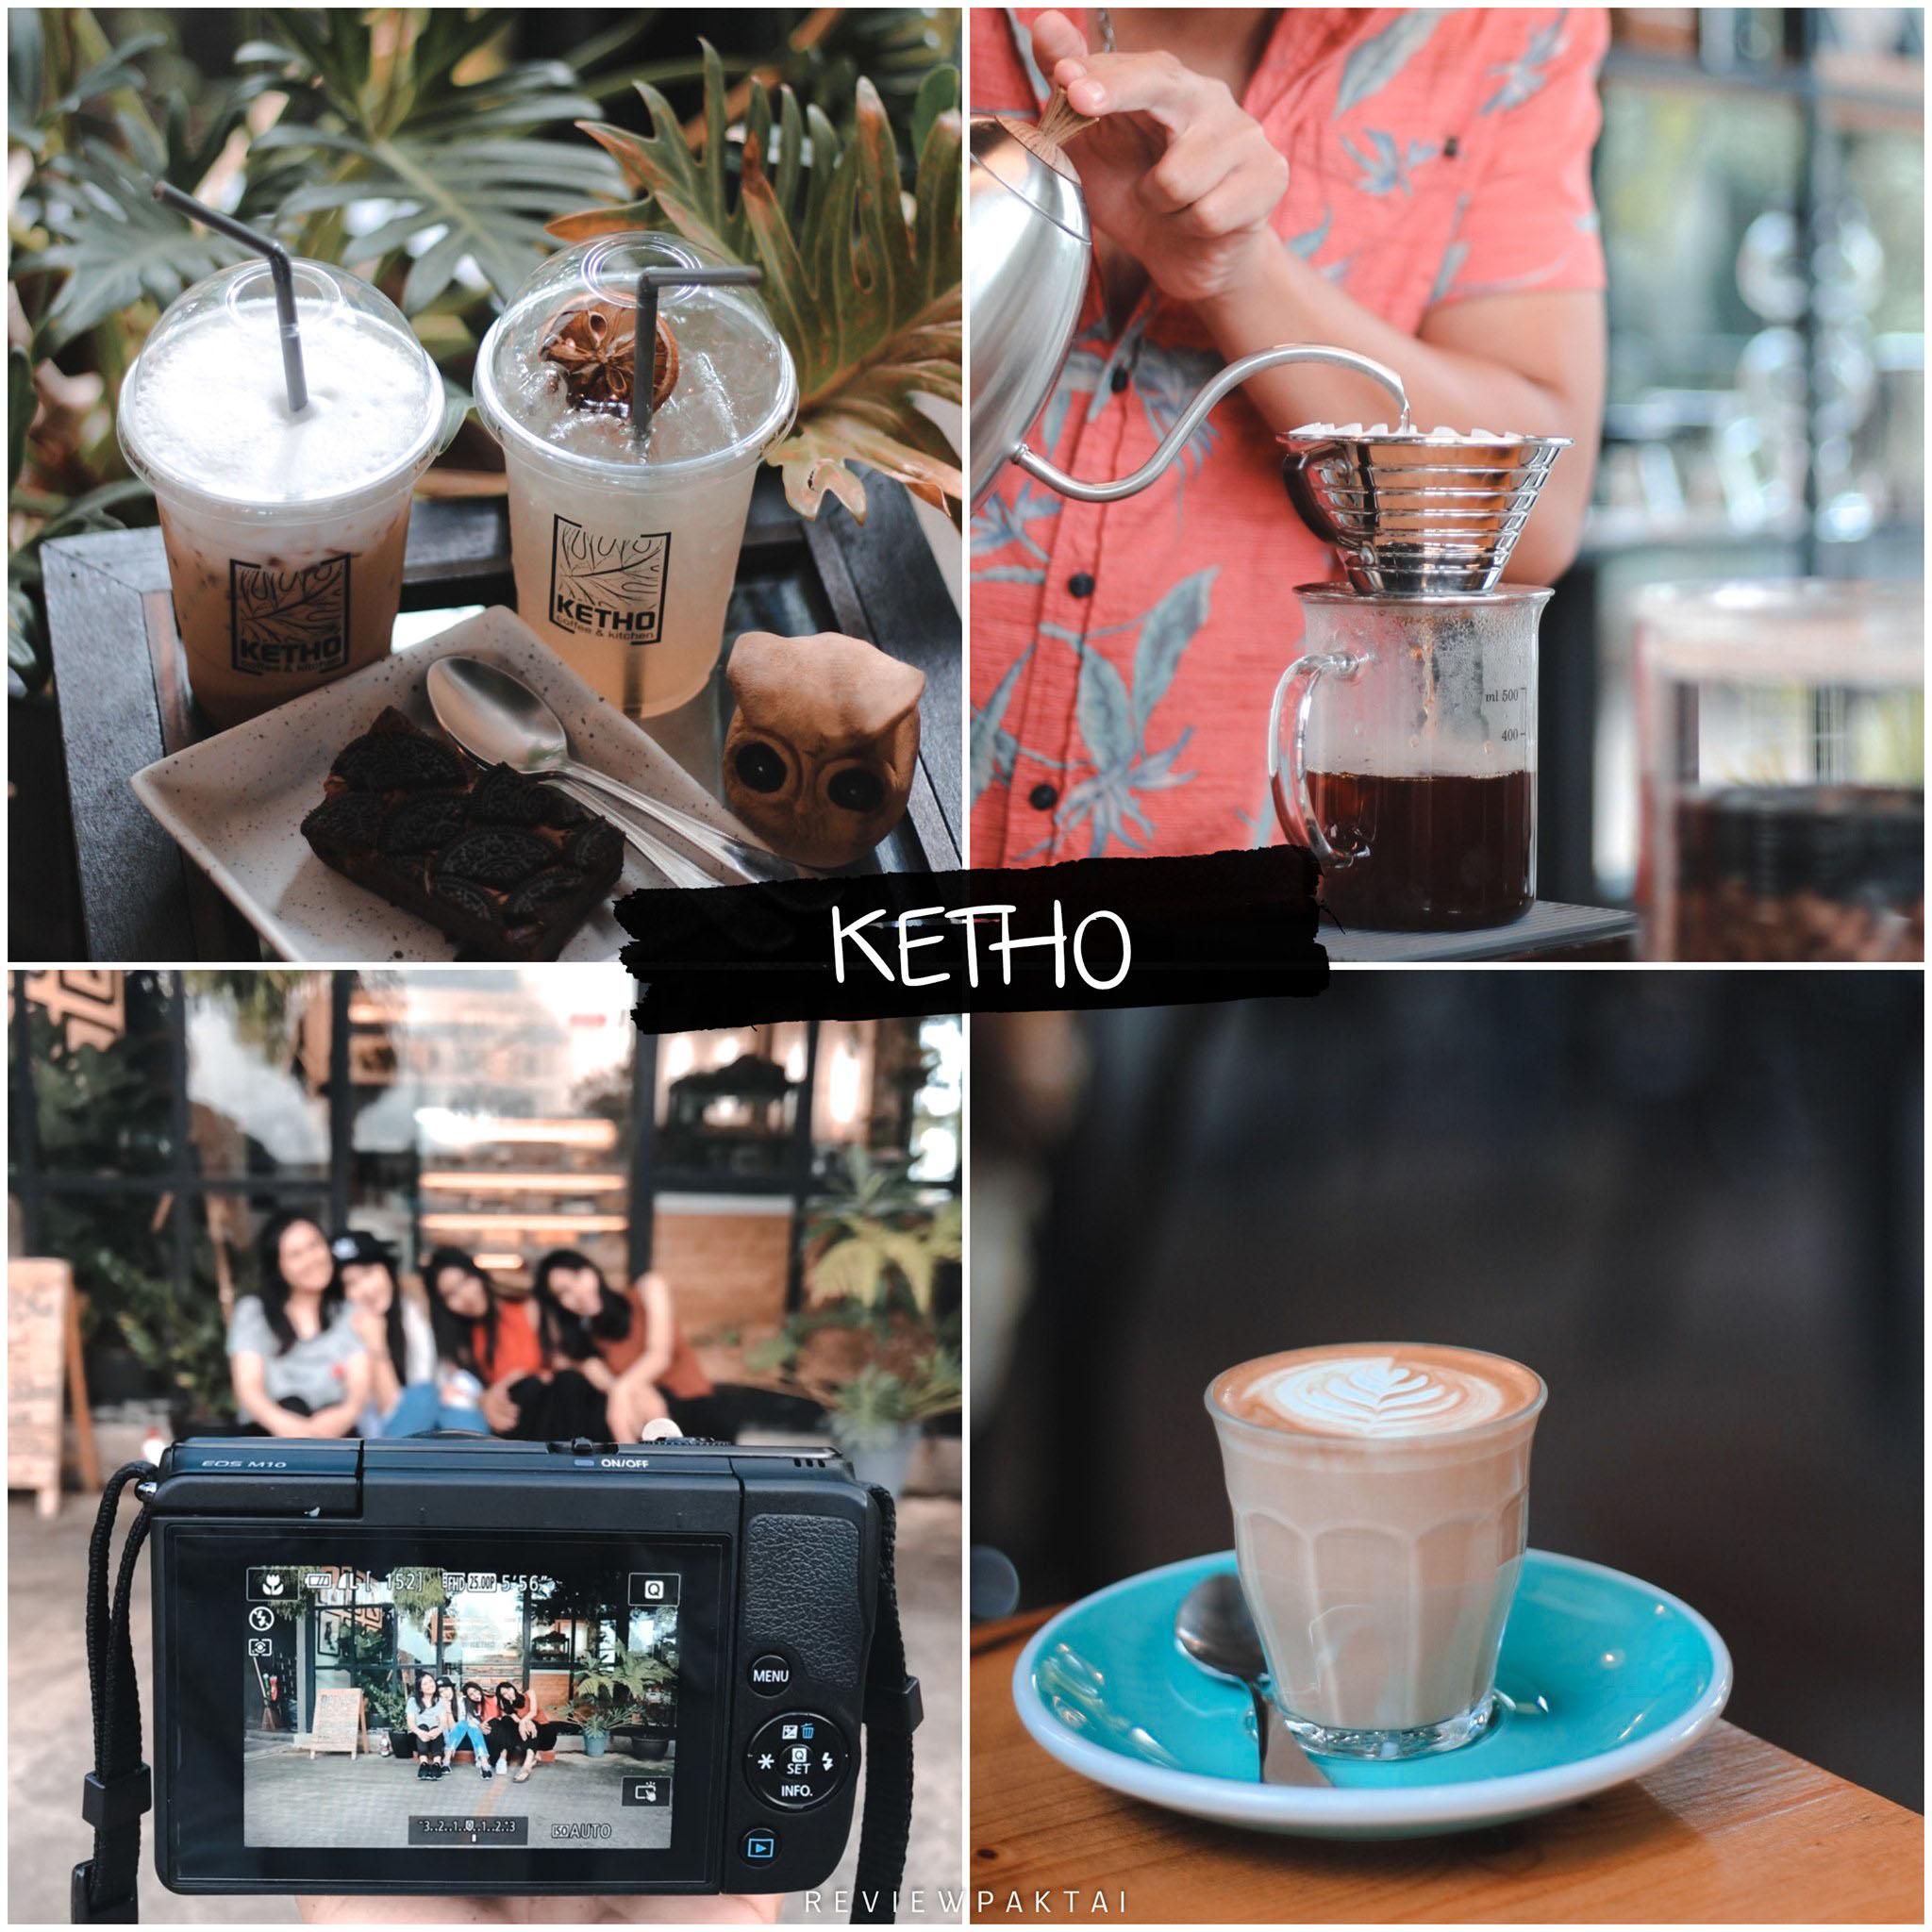 KetHo-Coffee---Kitchen ร้านสวยดีตกแต่งสไตล์-โครงเหล็กกับกระจกๆดูแบบ-modern-ต้นไม้ก็เยอะดี-นั่งสบายในร้านมีทั้งกาแฟ-เค้ก-และ-อาหารอีกเล็กน้อย-เช่น-สปาเกตตี้-กับ-สเต๊ก-เรื่องราคา-ก็-ตีเป็นเรท-กลางๆ-กาแฟเย็นก็-ประมาณ-แก้วละ-70-บาท-เค้ก-90-บาท-และสปาเกตตี้-160-บาท ภูเก็ต,คาเฟ่,ที่เที่ยว,ร้านกาแฟ,เด็ด,อร่อย,ต้องลอง